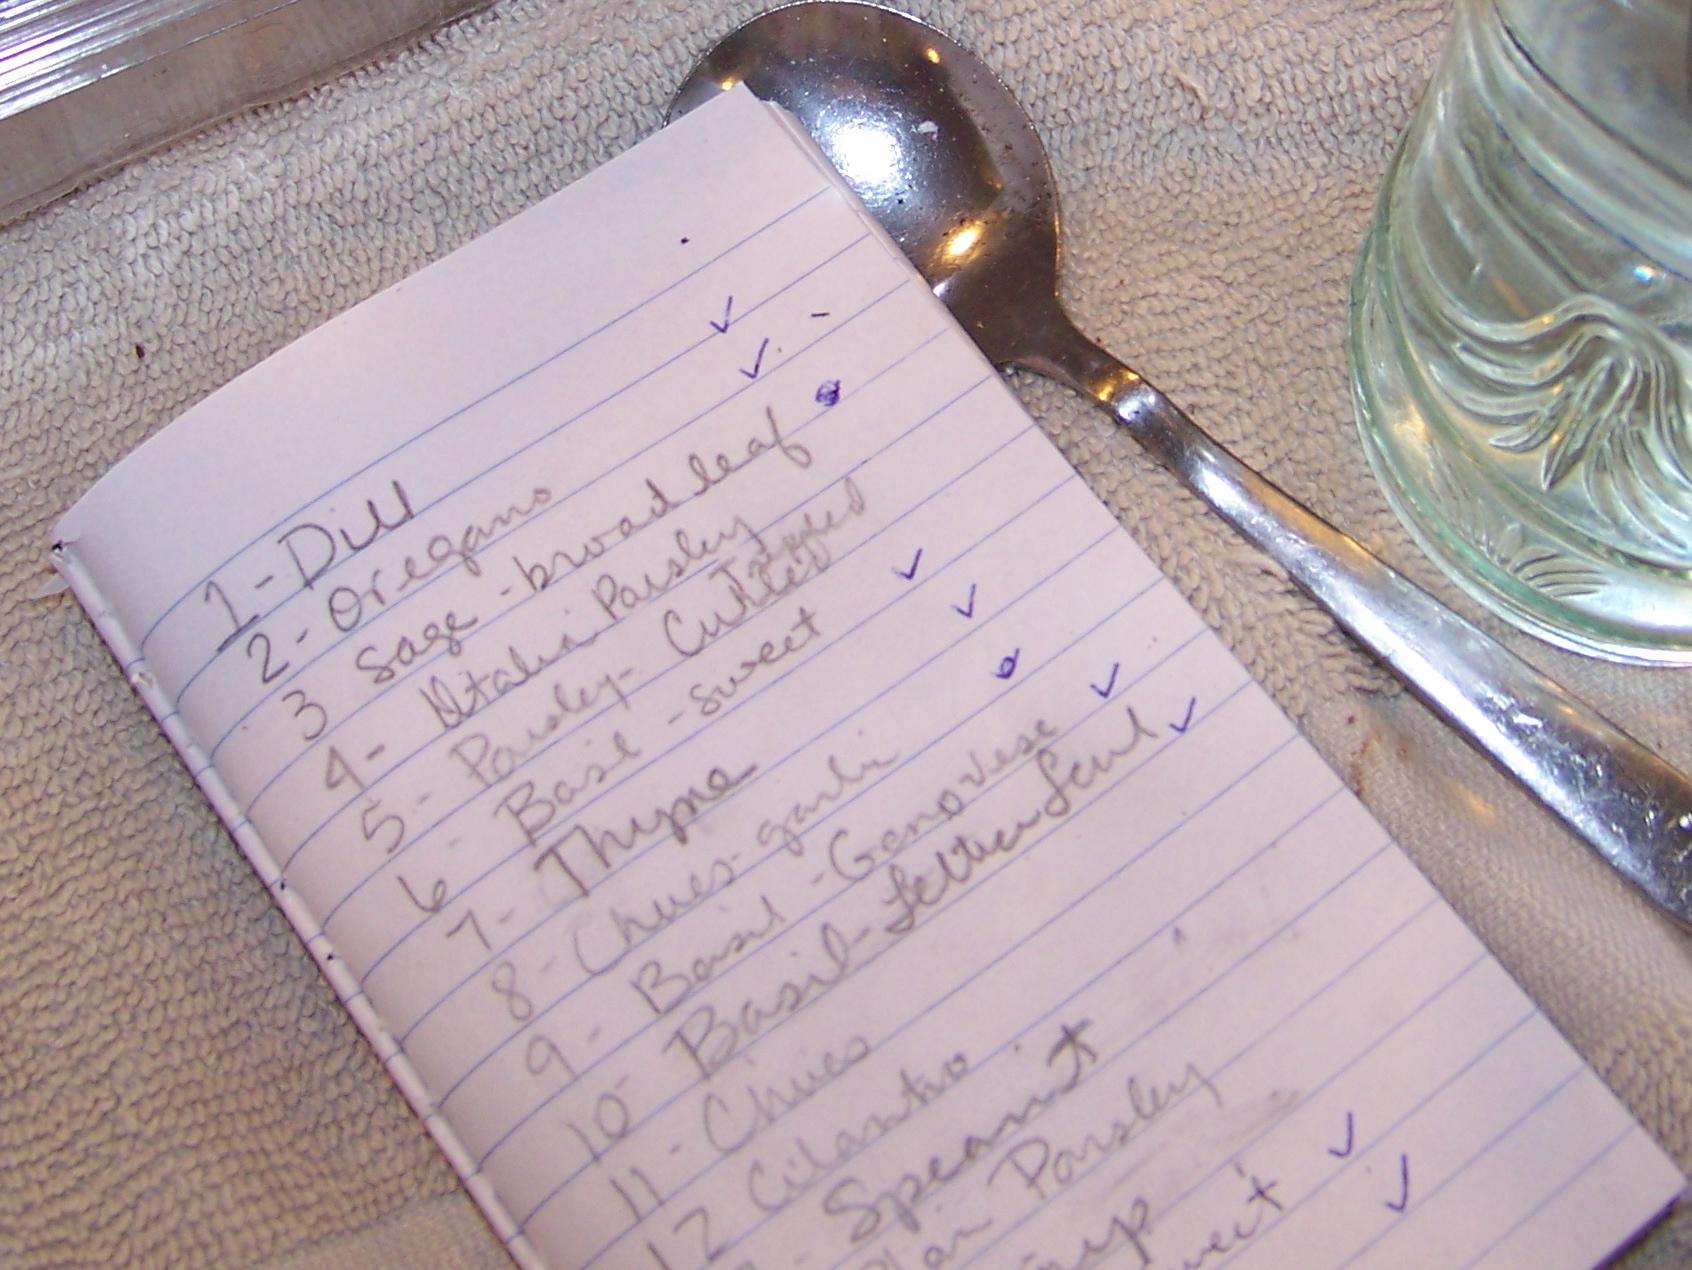 List of goodies!